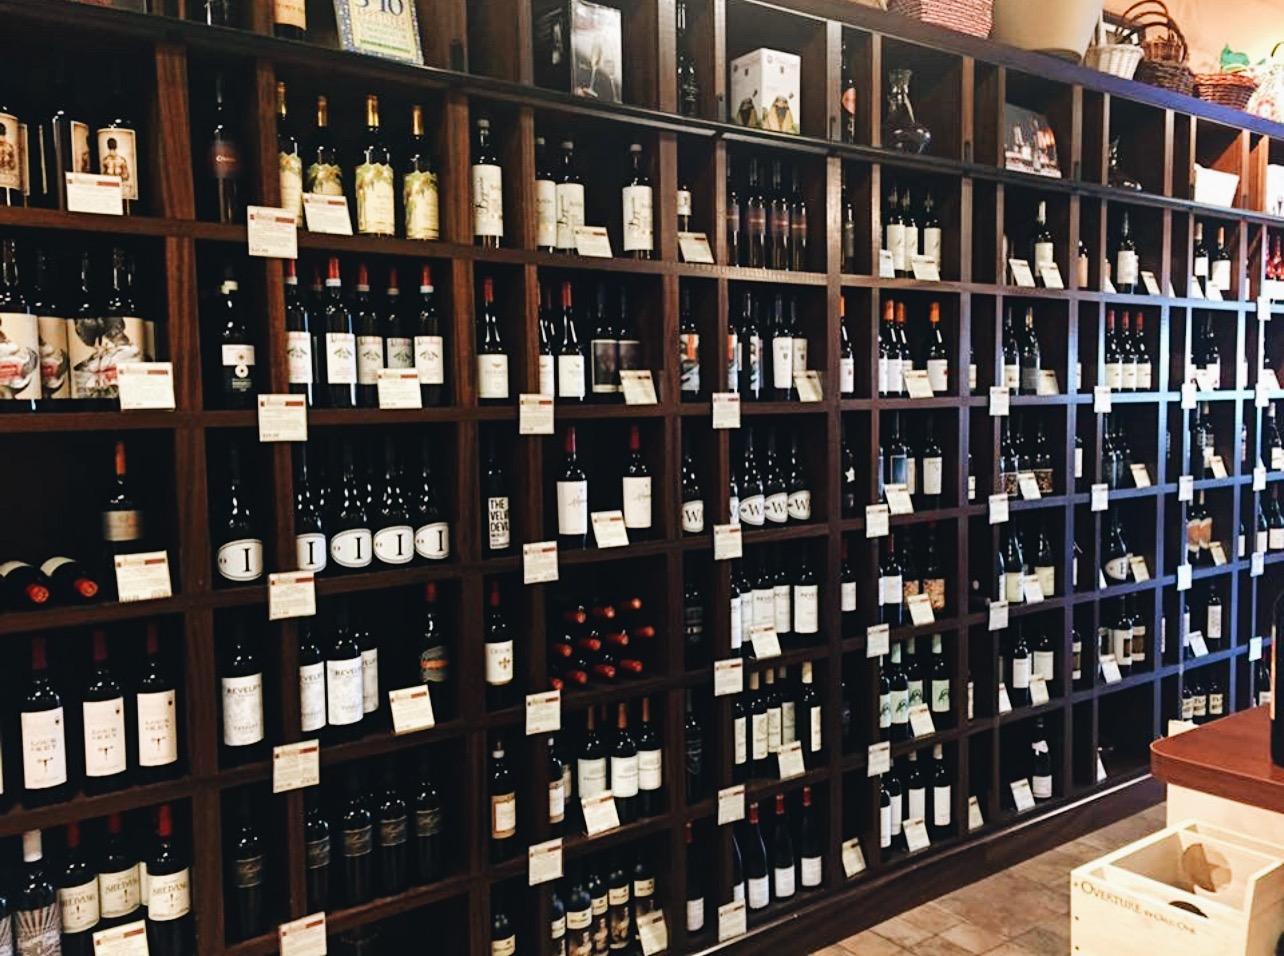 shelves filled with bottled wine